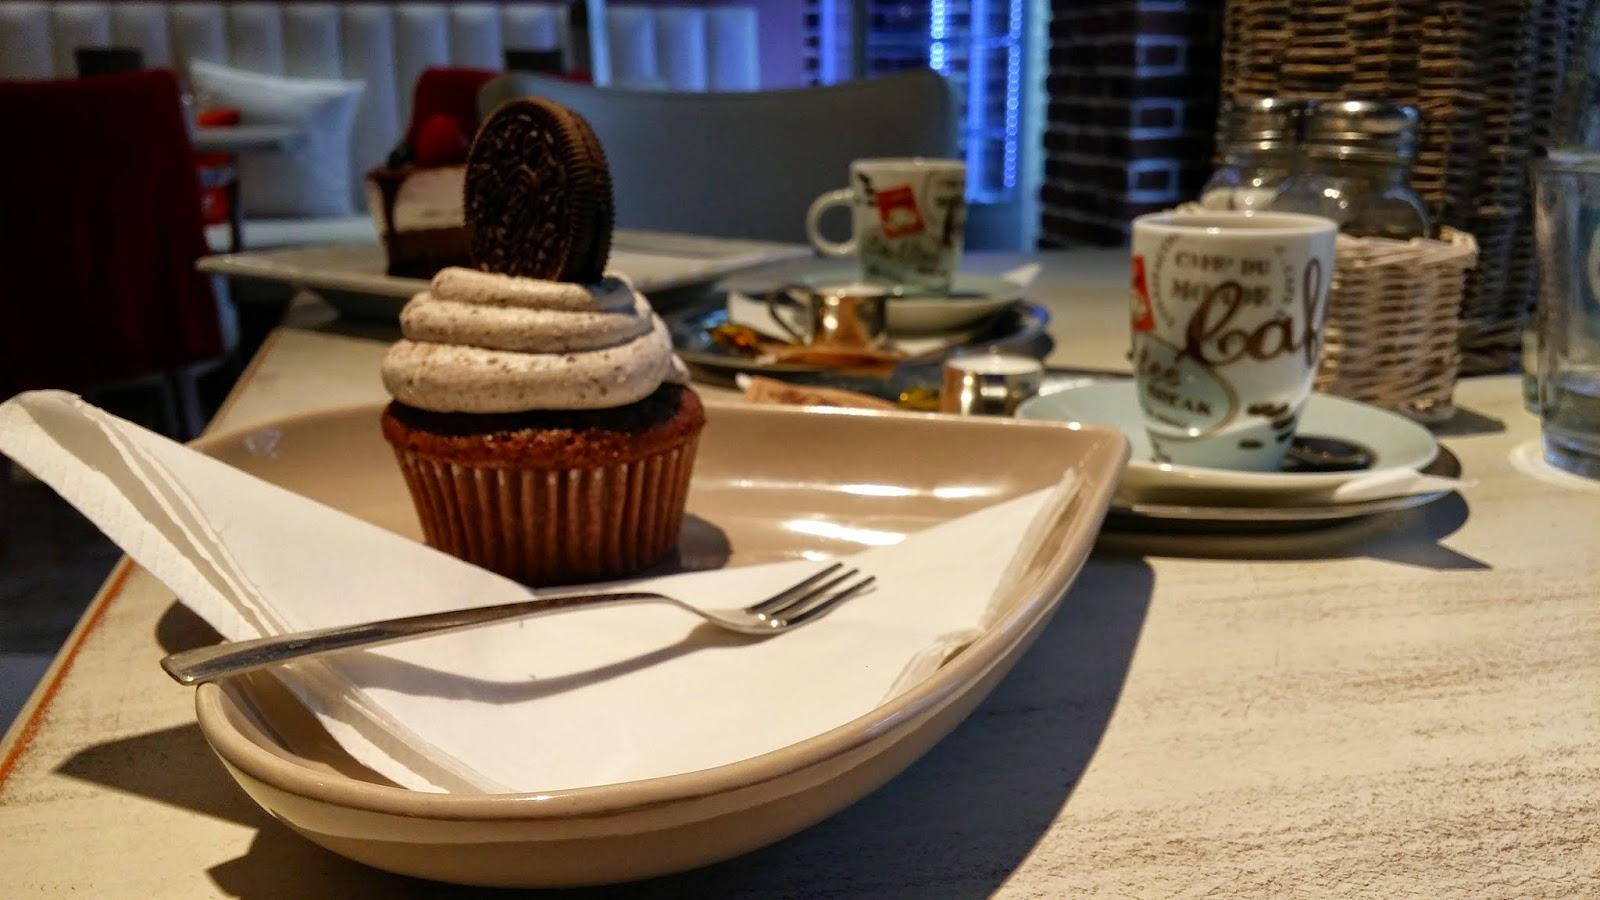 Oreo Cupcake v La Familia Café